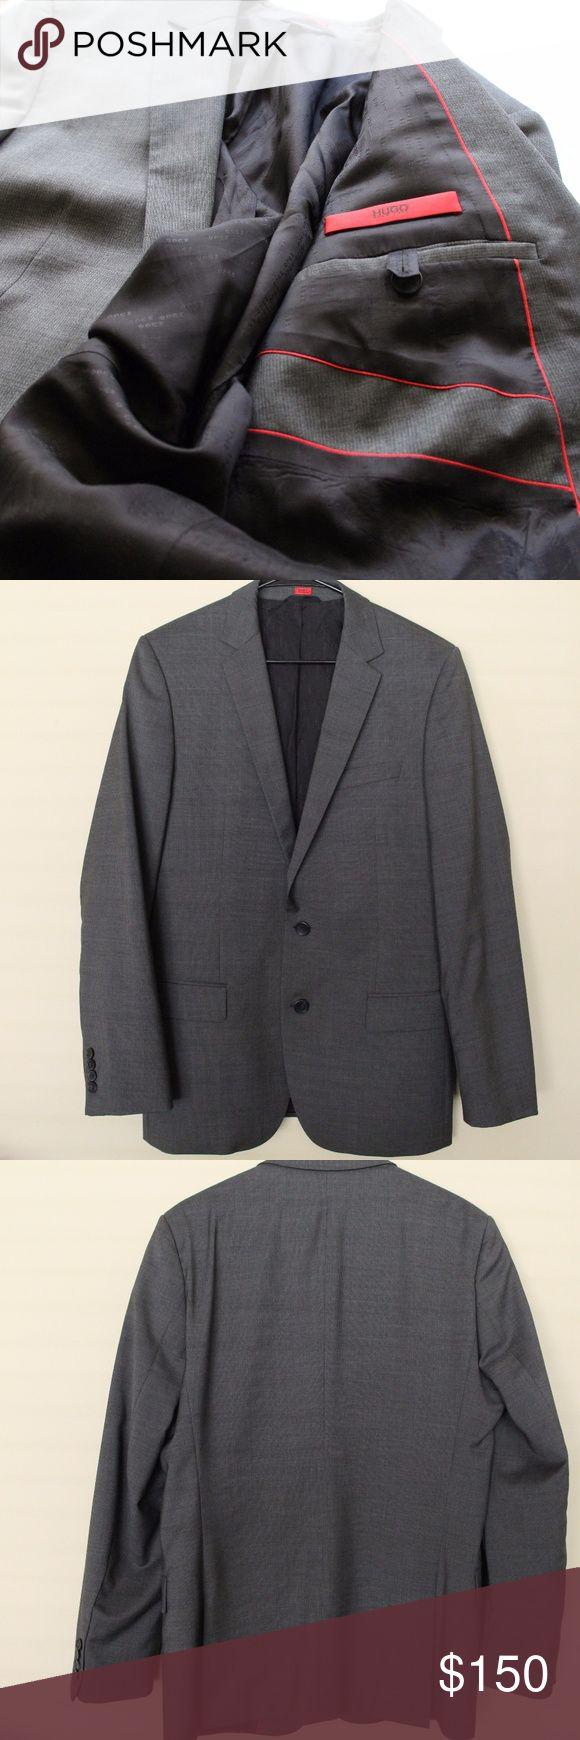 best 25 hugo boss suit ideas on pinterest hugo boss. Black Bedroom Furniture Sets. Home Design Ideas